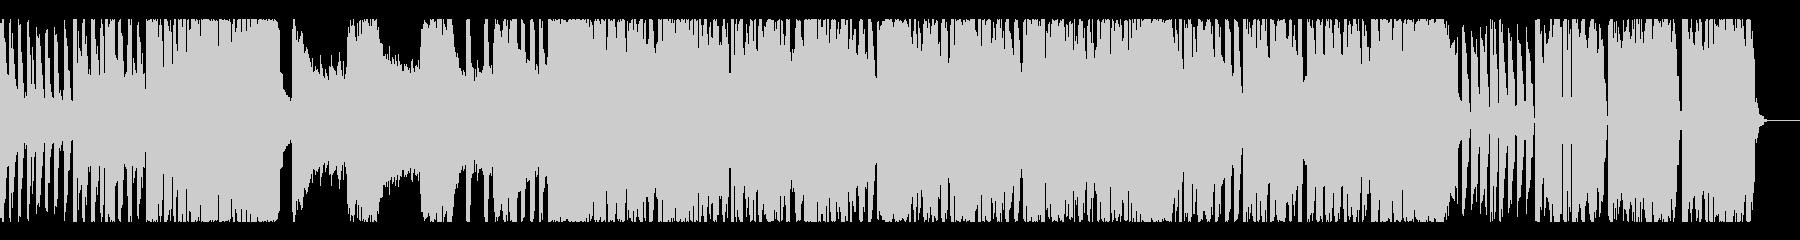 Zorupus - Hopeの未再生の波形